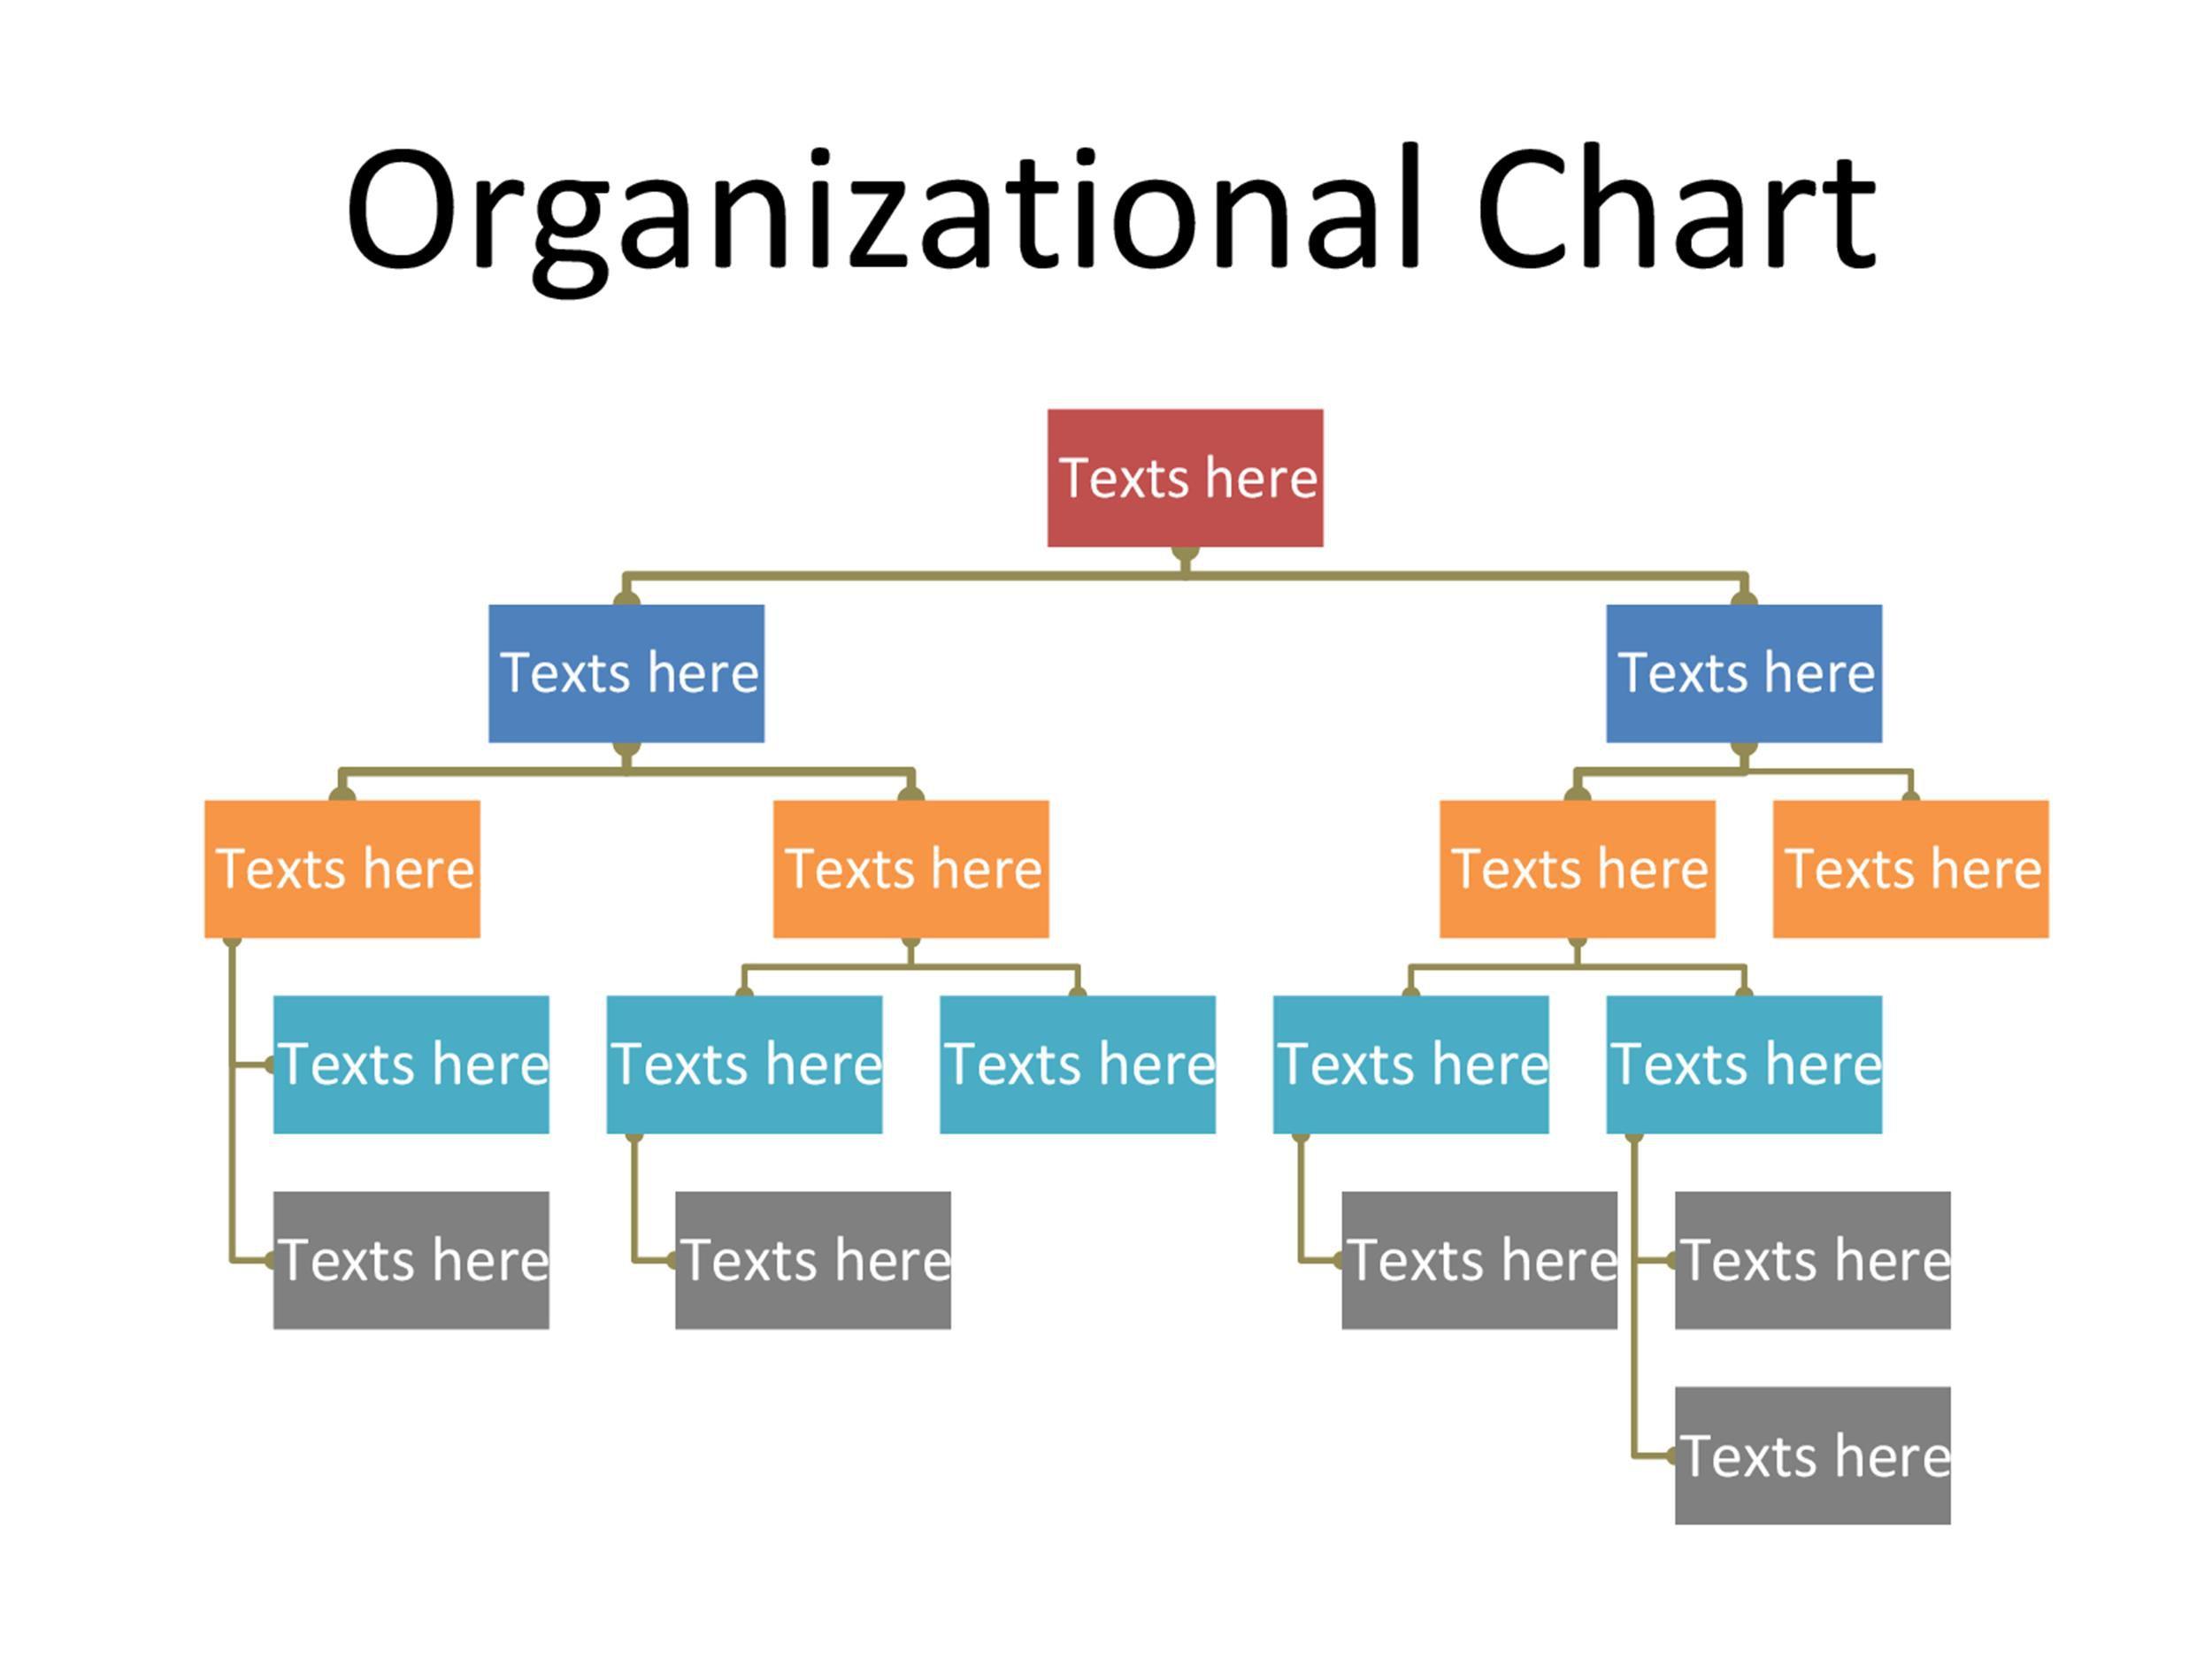 007 Shocking Microsoft Word Organization Chart Template High Definition  Organizational Download 2007Full